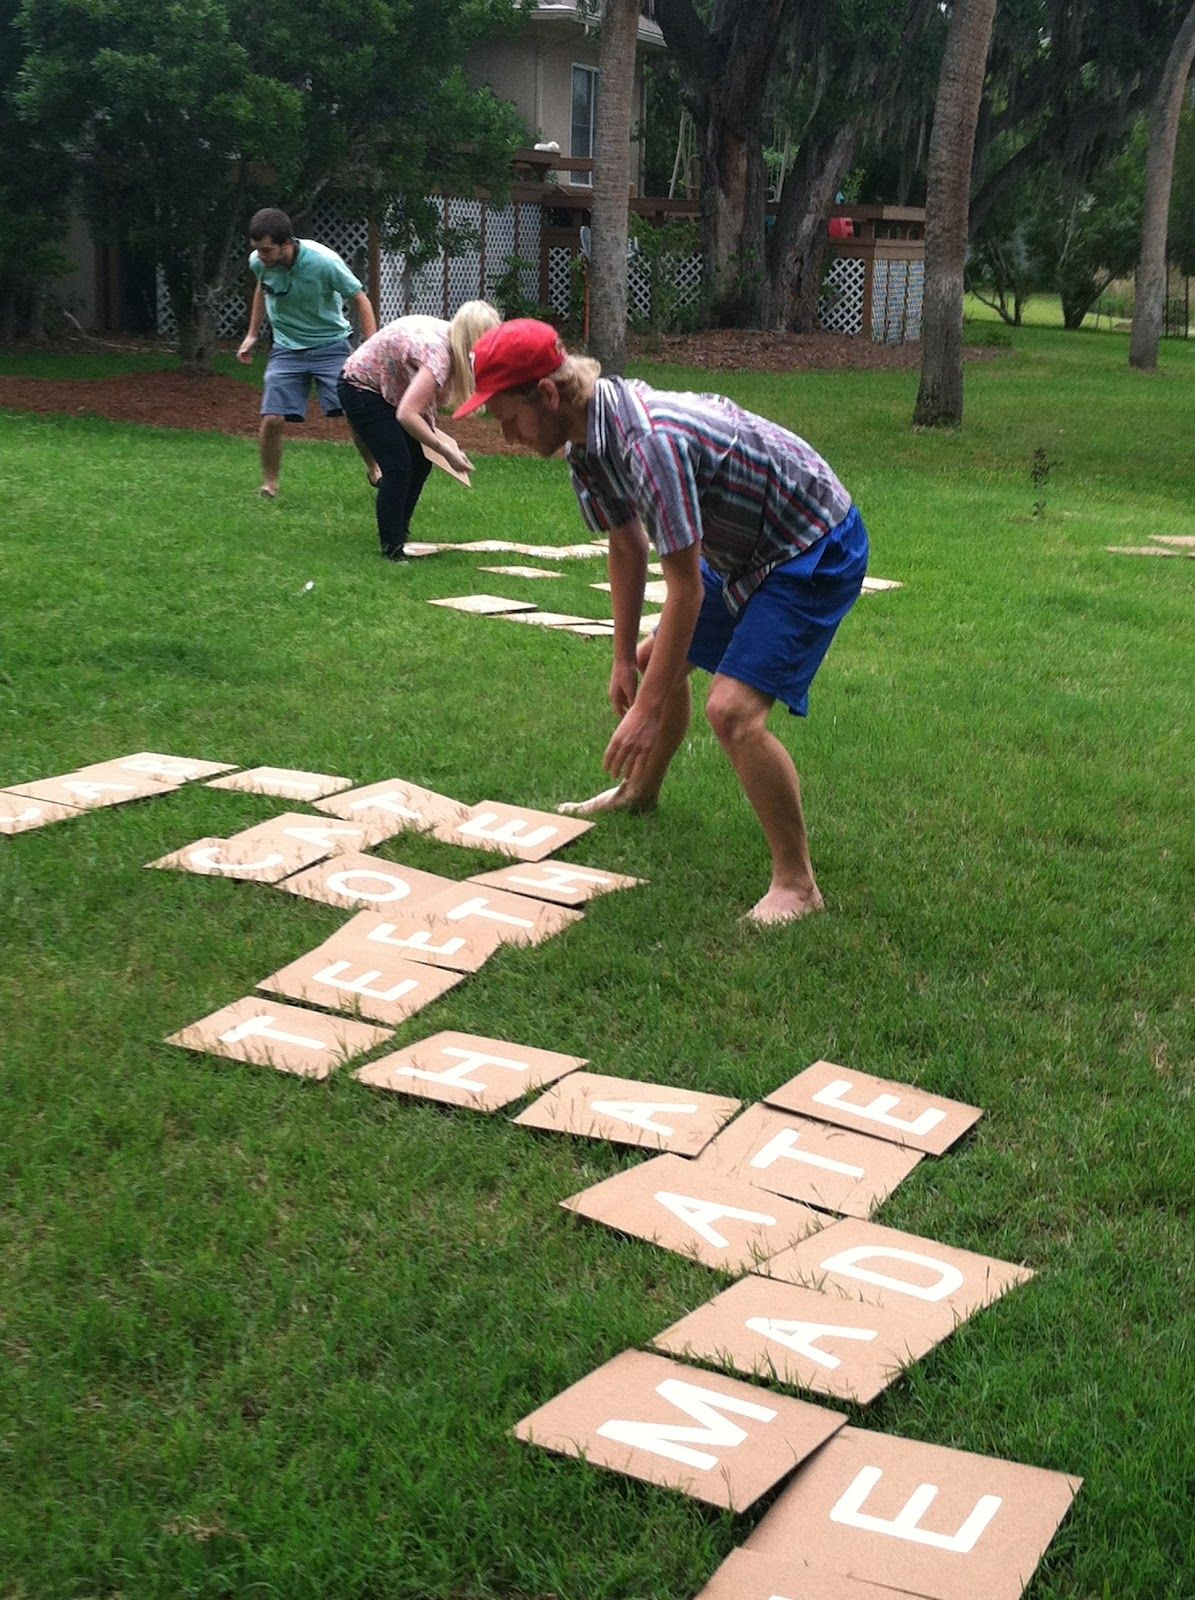 25 Outdoor Summer Activities For Kids Backyard Fun Backyard Games Fun